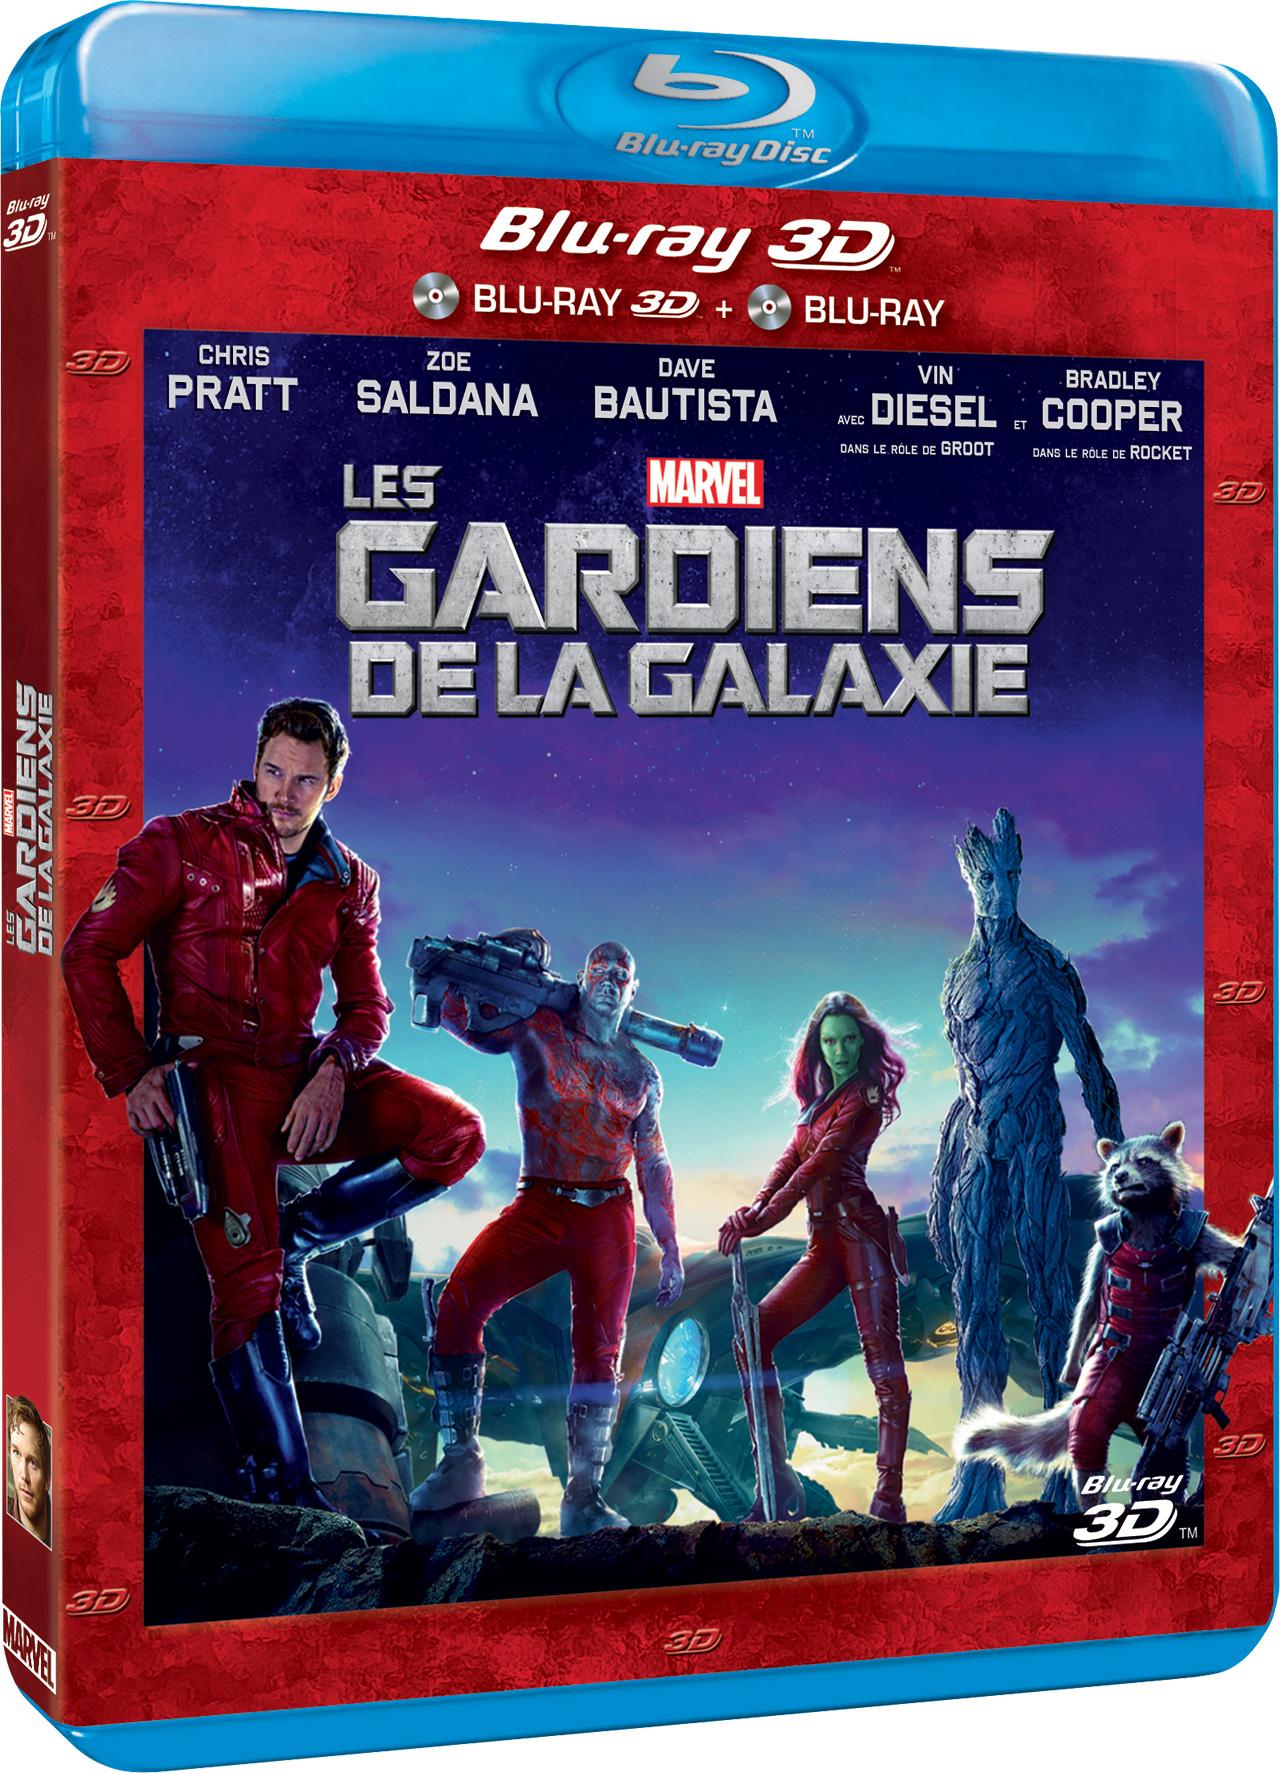 Les Gardiens de la galaxie - Blu-ray 3D